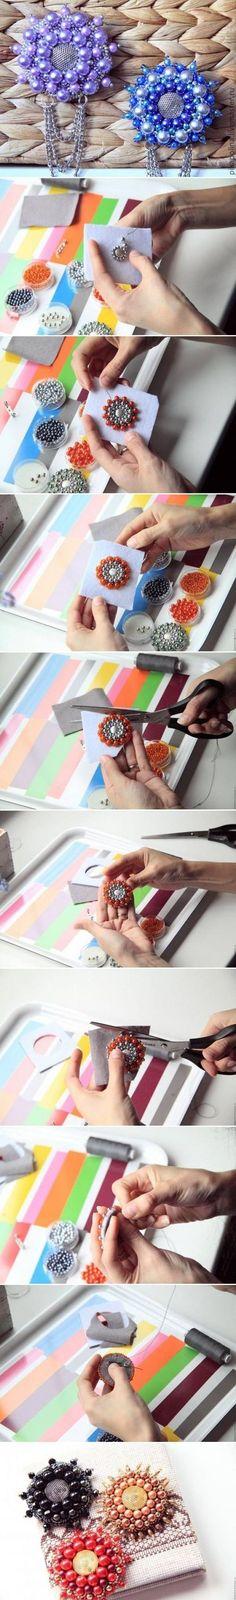 DIY Bead Flower Broach - #art, #diy, craft